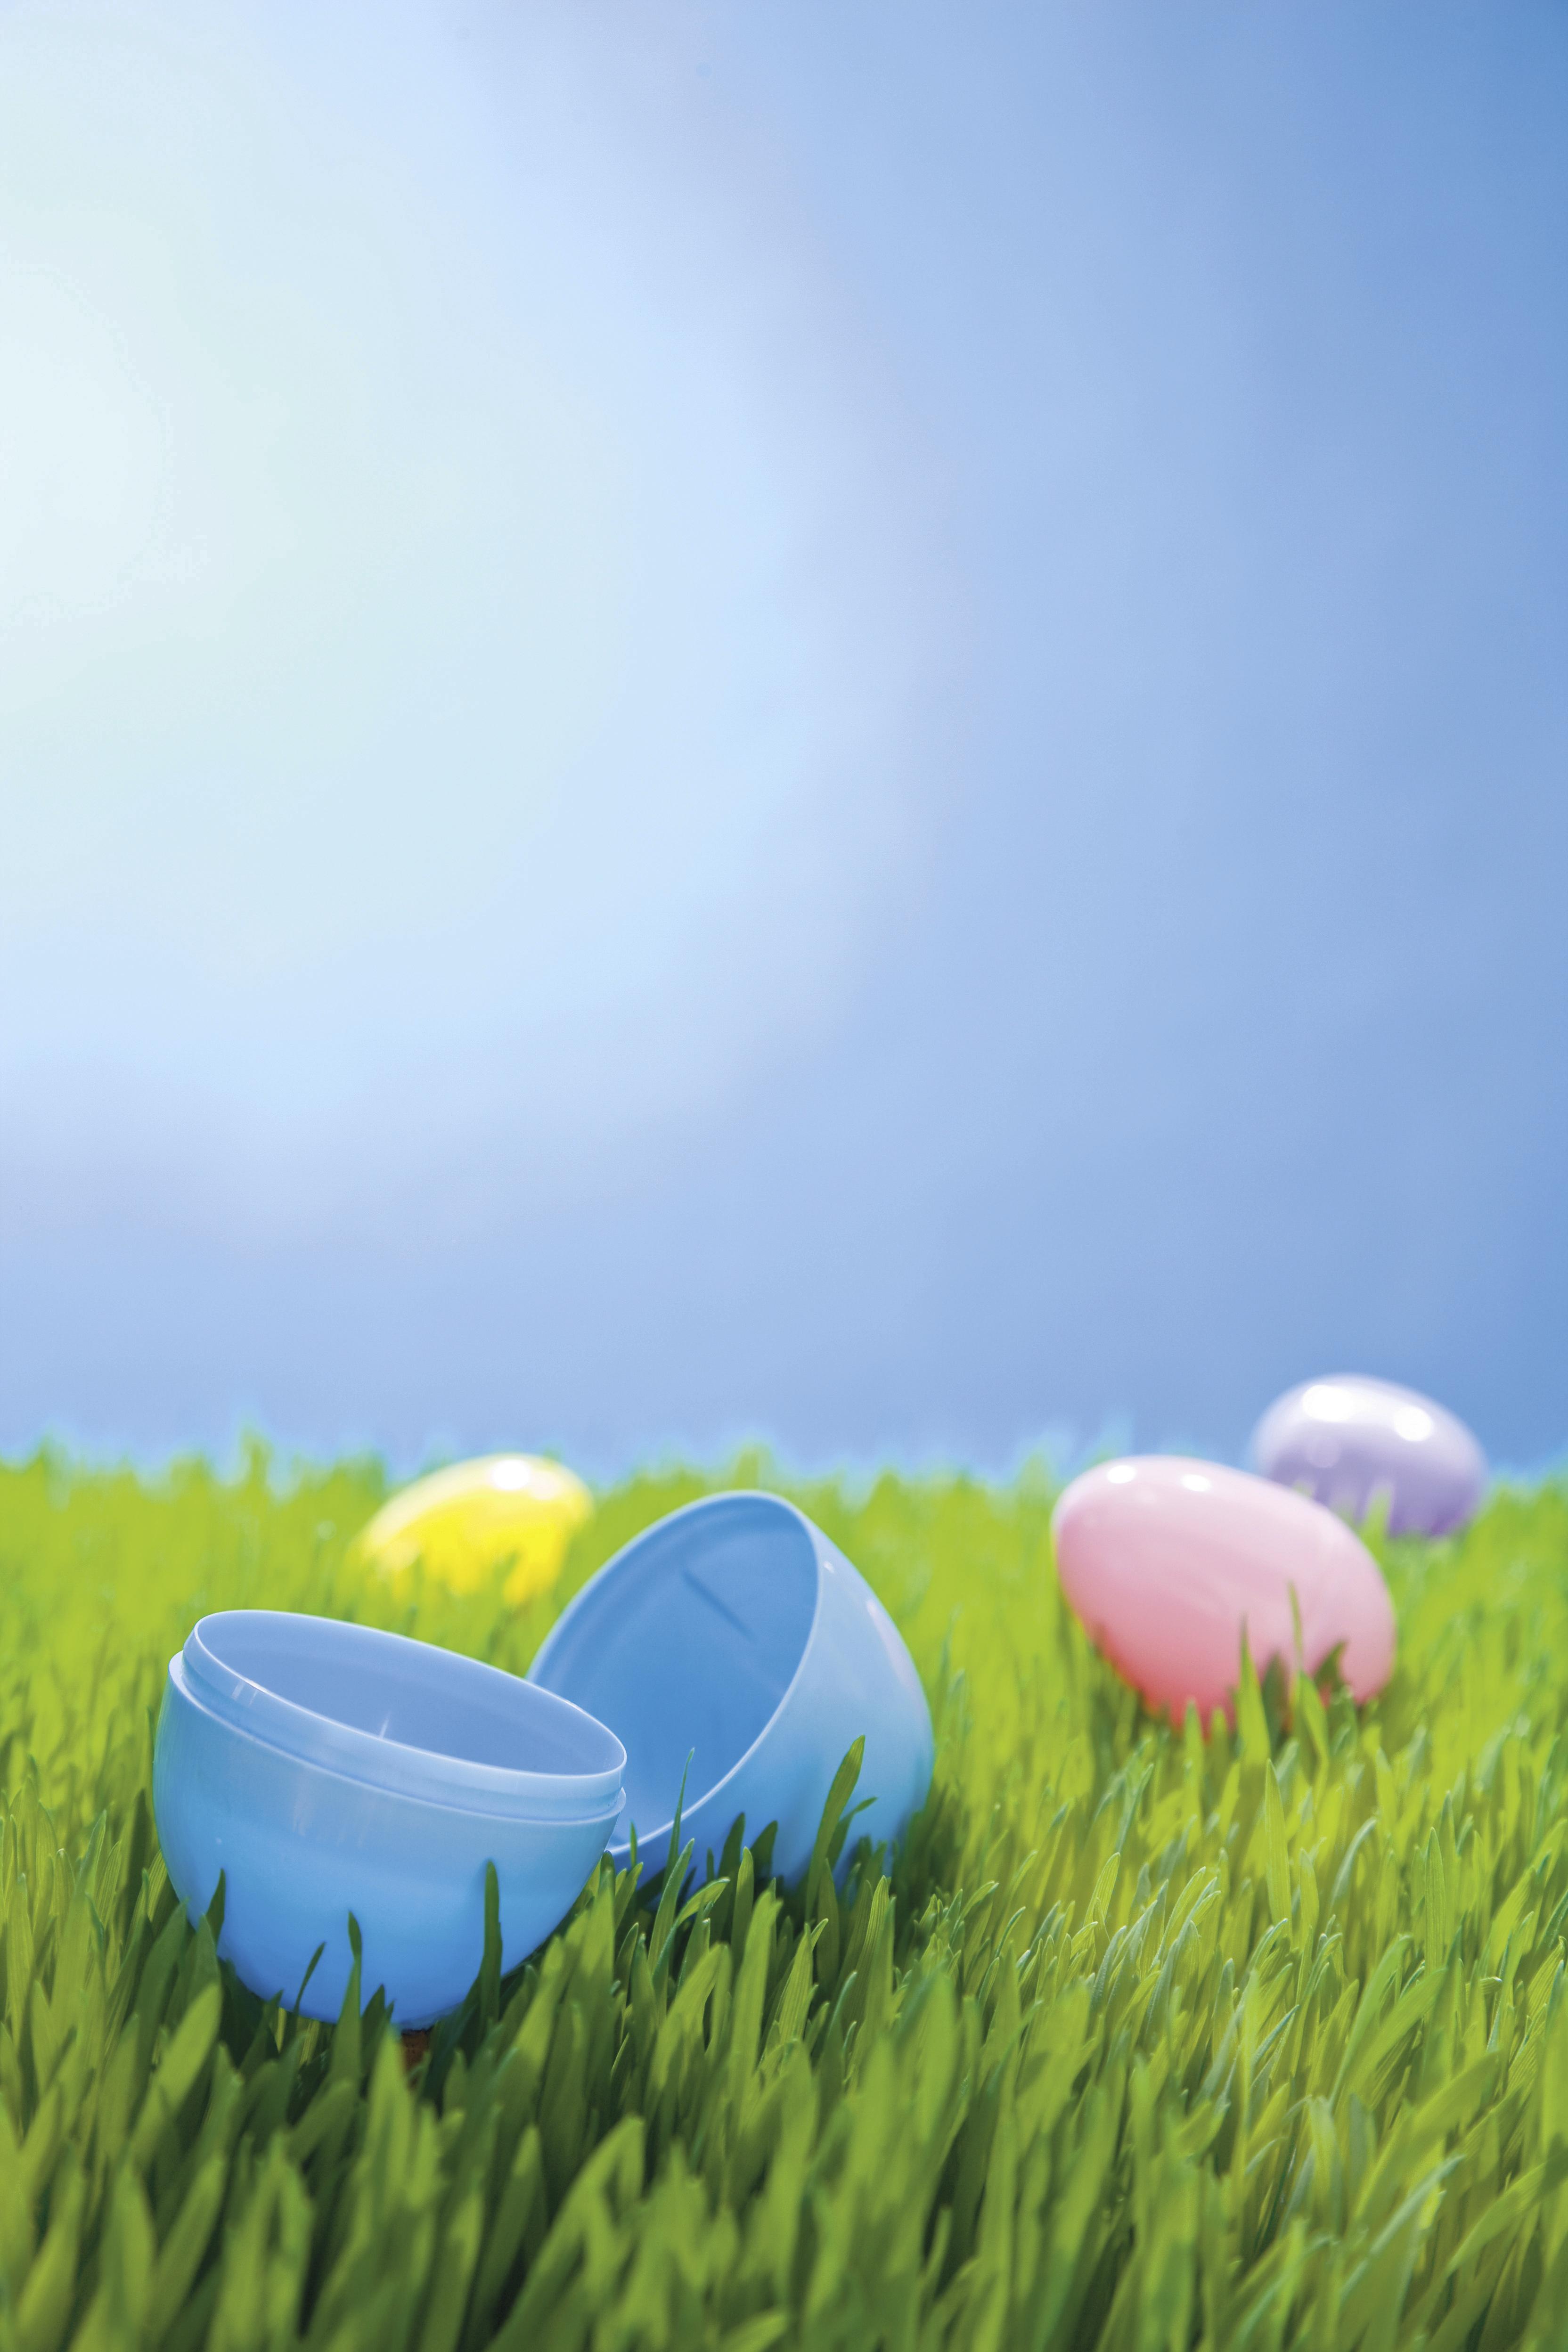 Several plastic Easter eggs lying in green grass.